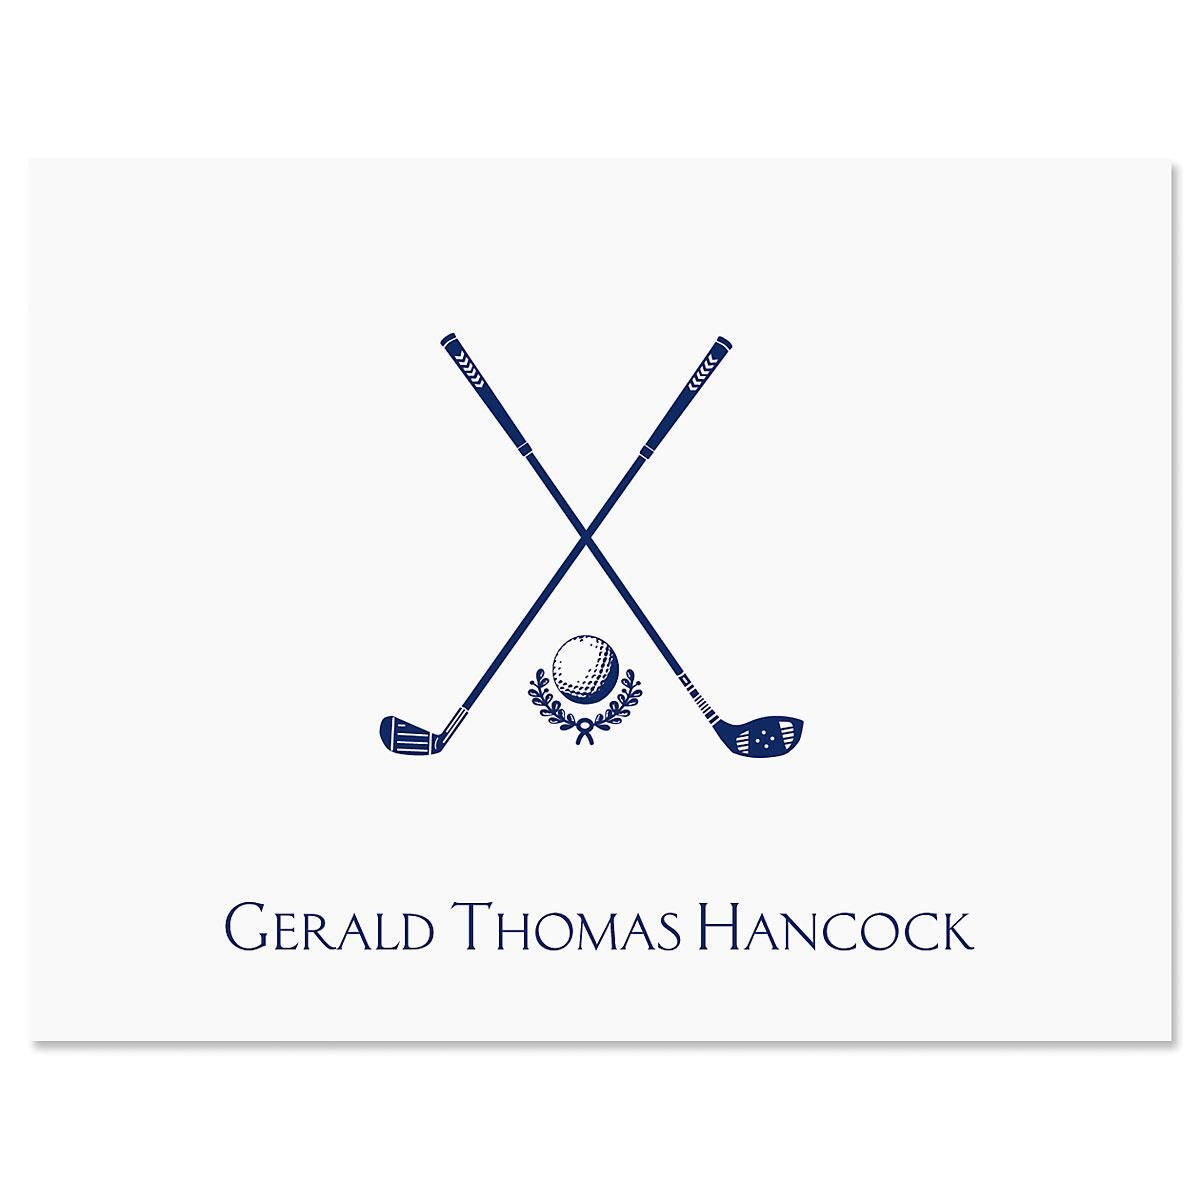 Designer deals club for hancock - Golf Note Cards